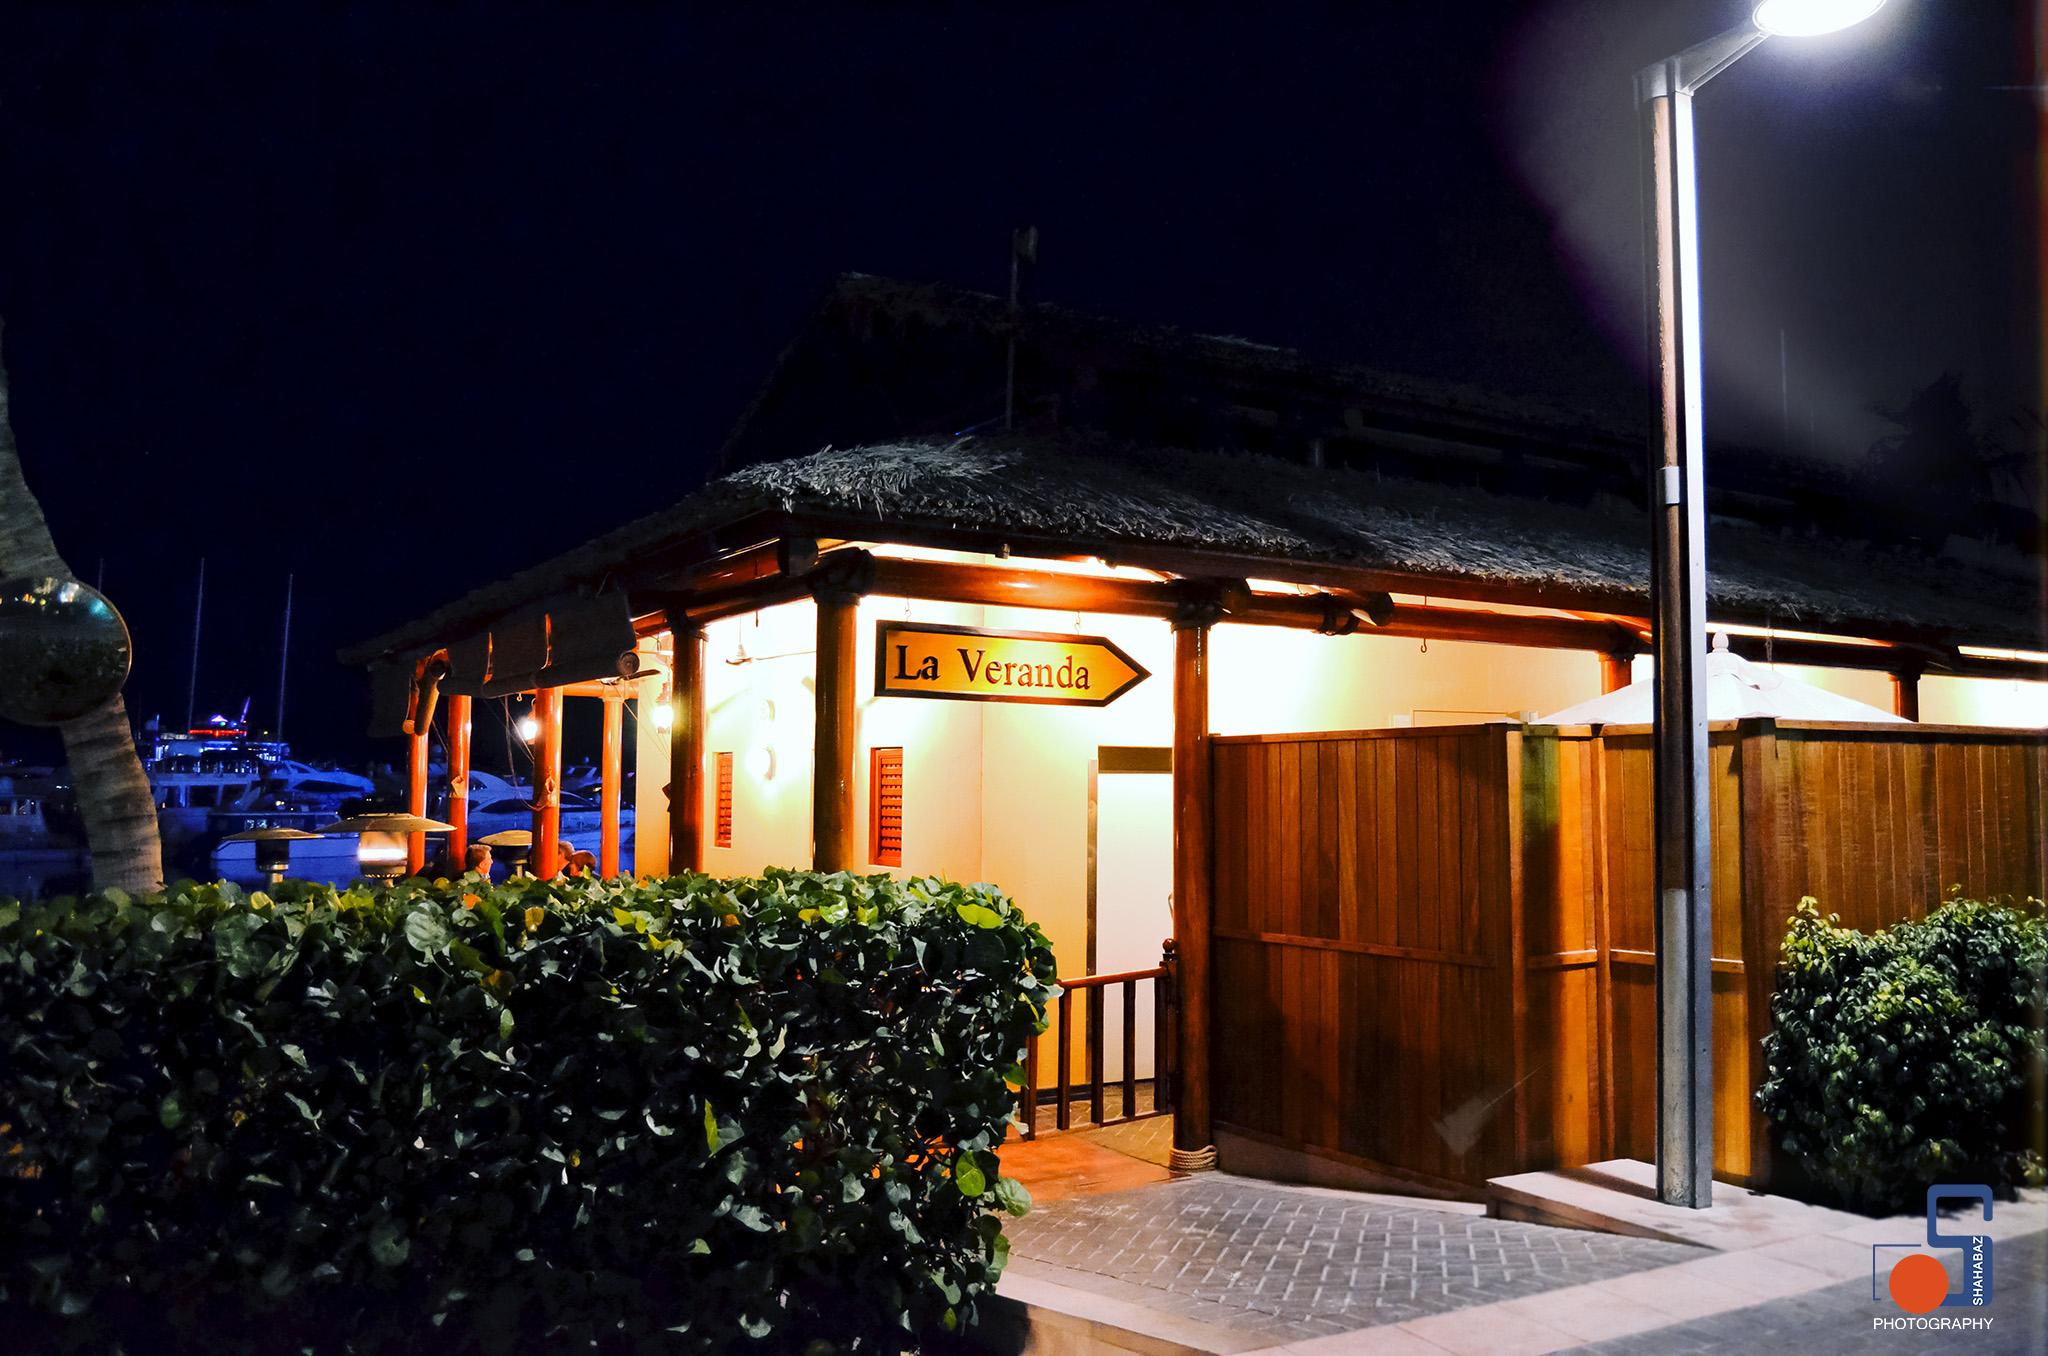 La veranda restaurant - Veranda cuisine prix ...